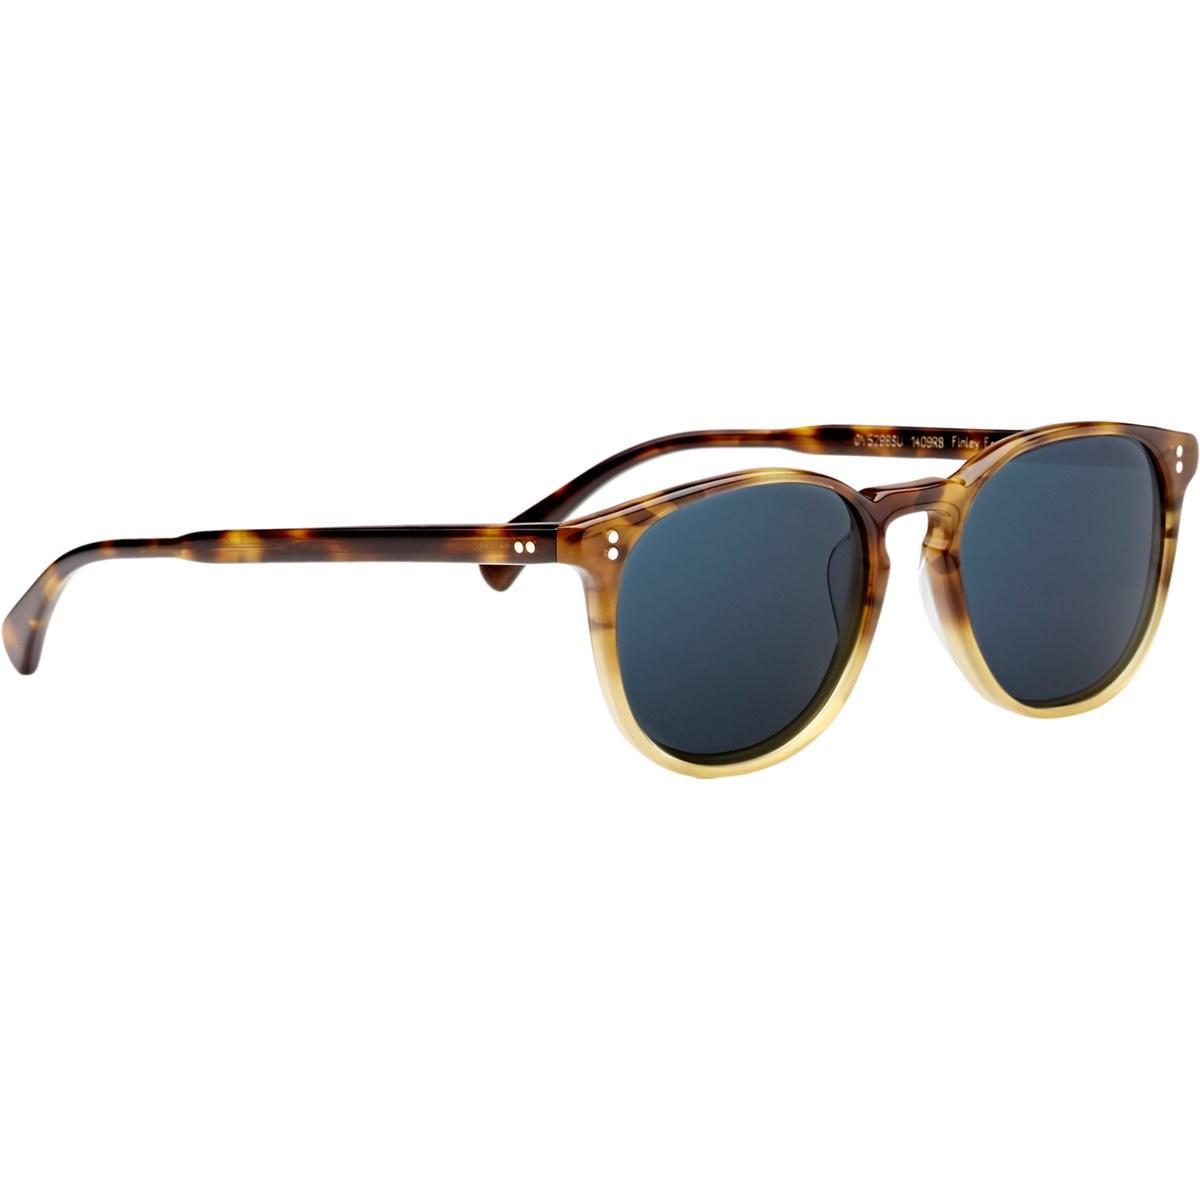 d14439c48bf Oliver Peoples - Blue Finley Esq. Sunglasses for Men - Lyst. View fullscreen